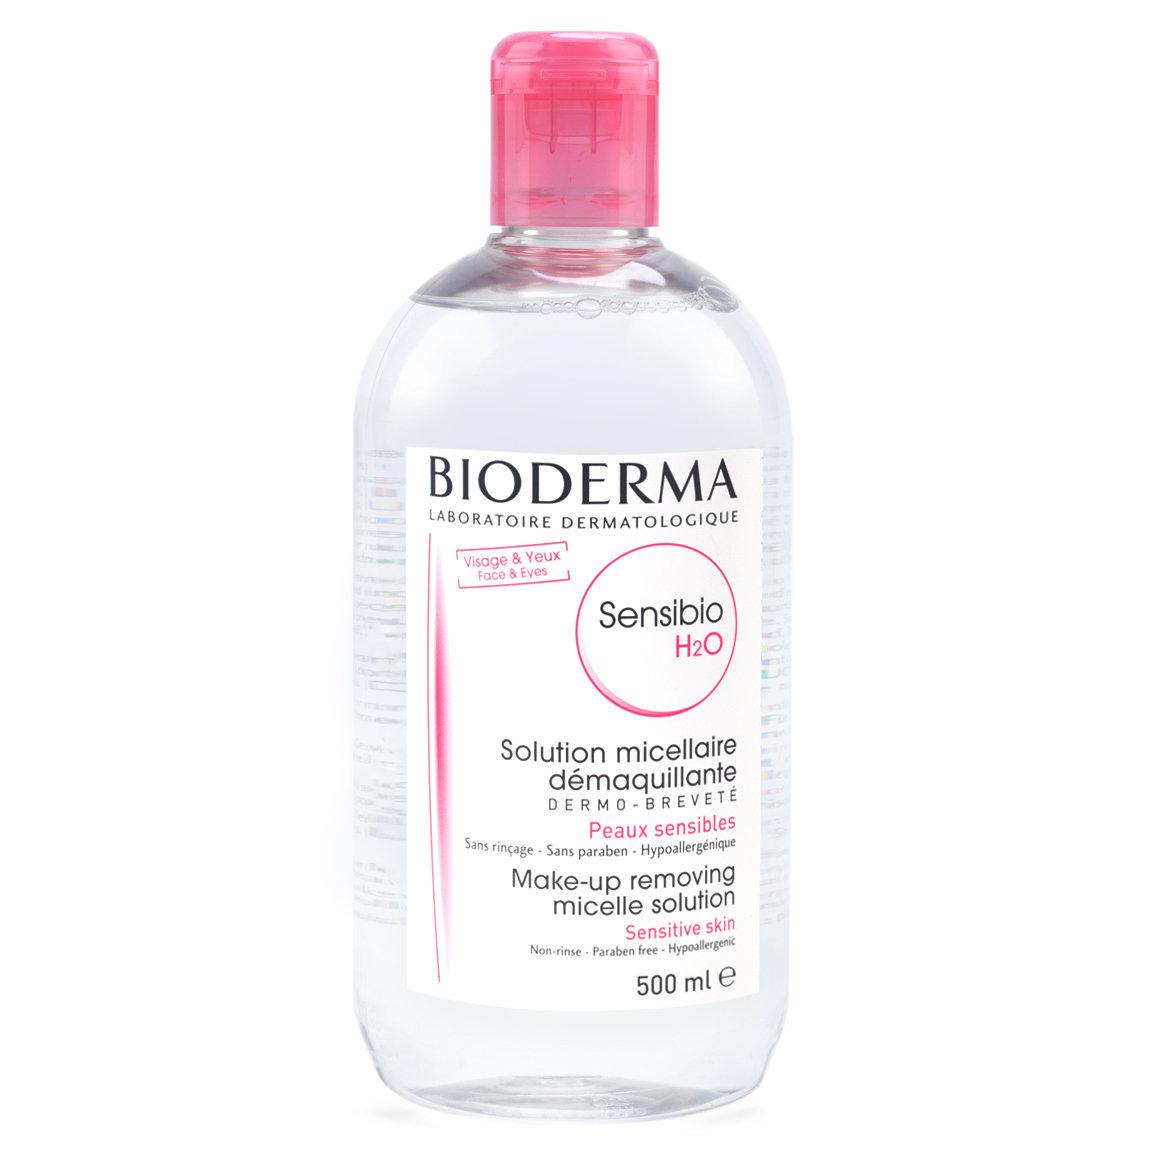 Bioderma Sensibio H2O 500 ml product swatch.